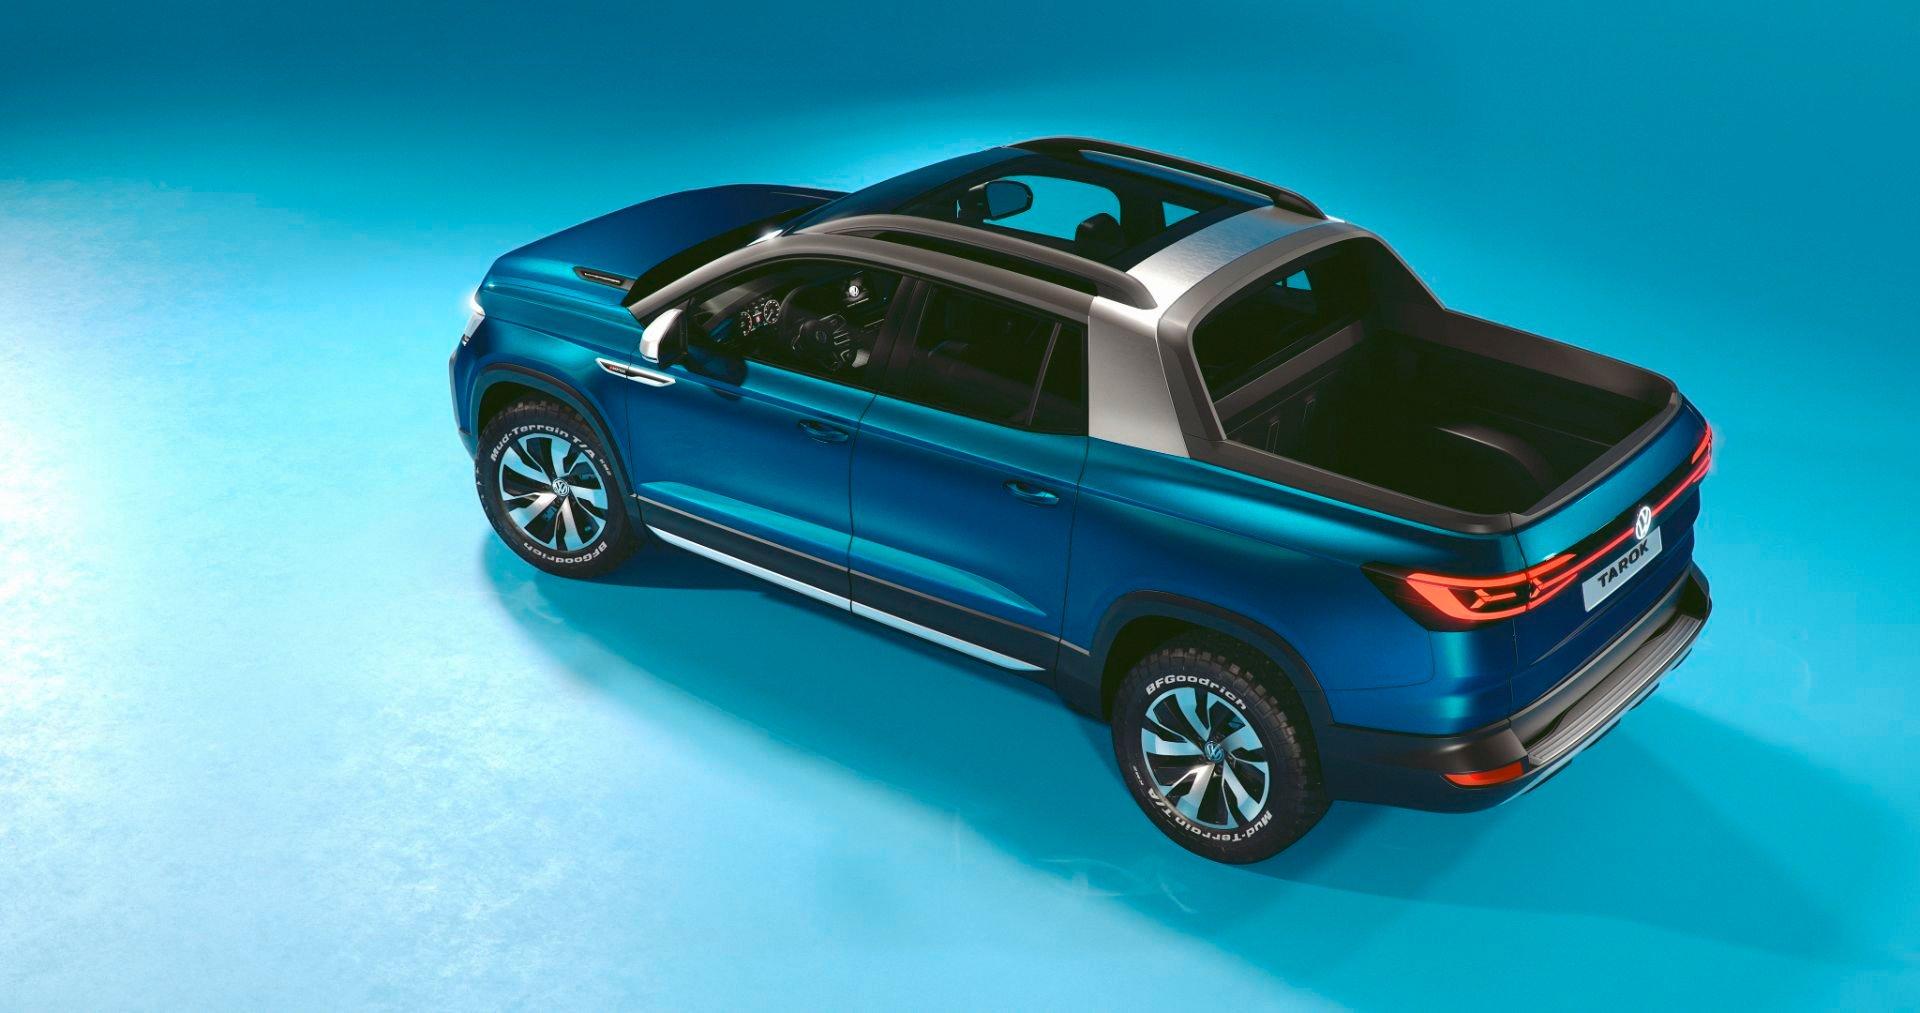 volkswagen tarok concept azul lateral traseira vista de cima foto em estudio